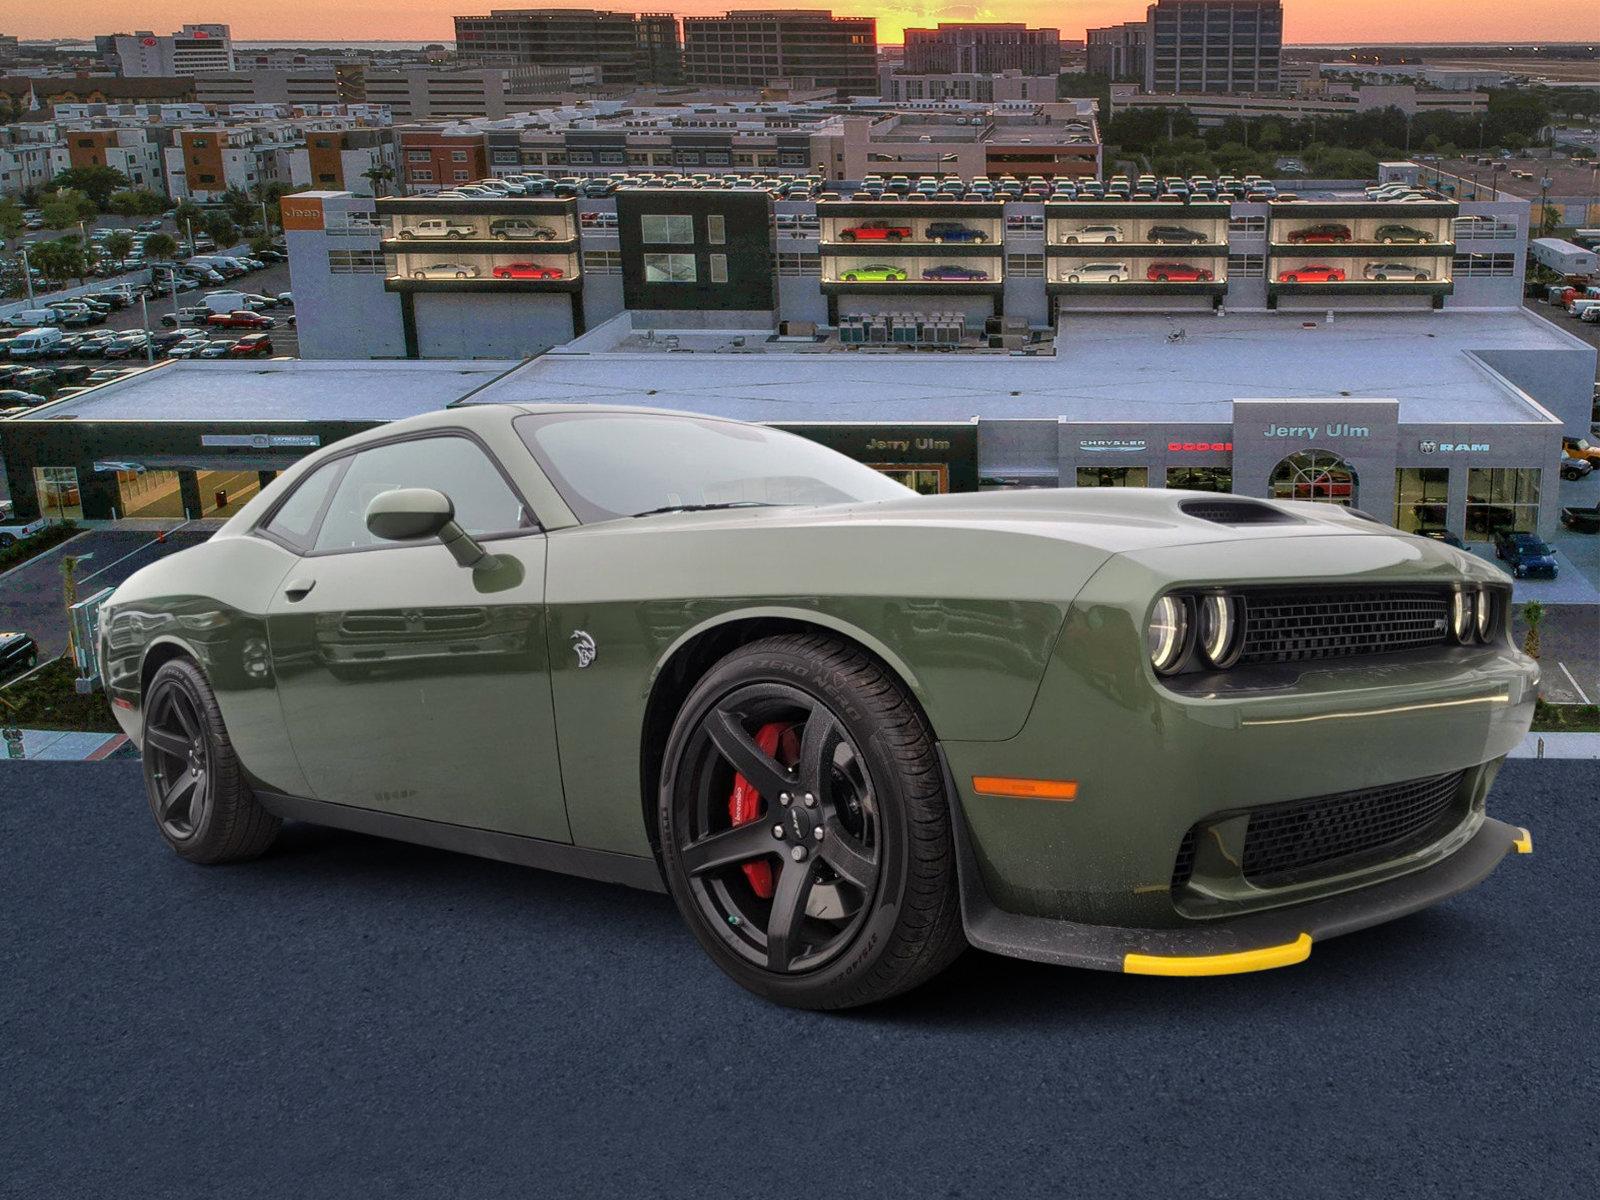 New 2020 DODGE Challenger SRT Hellcat